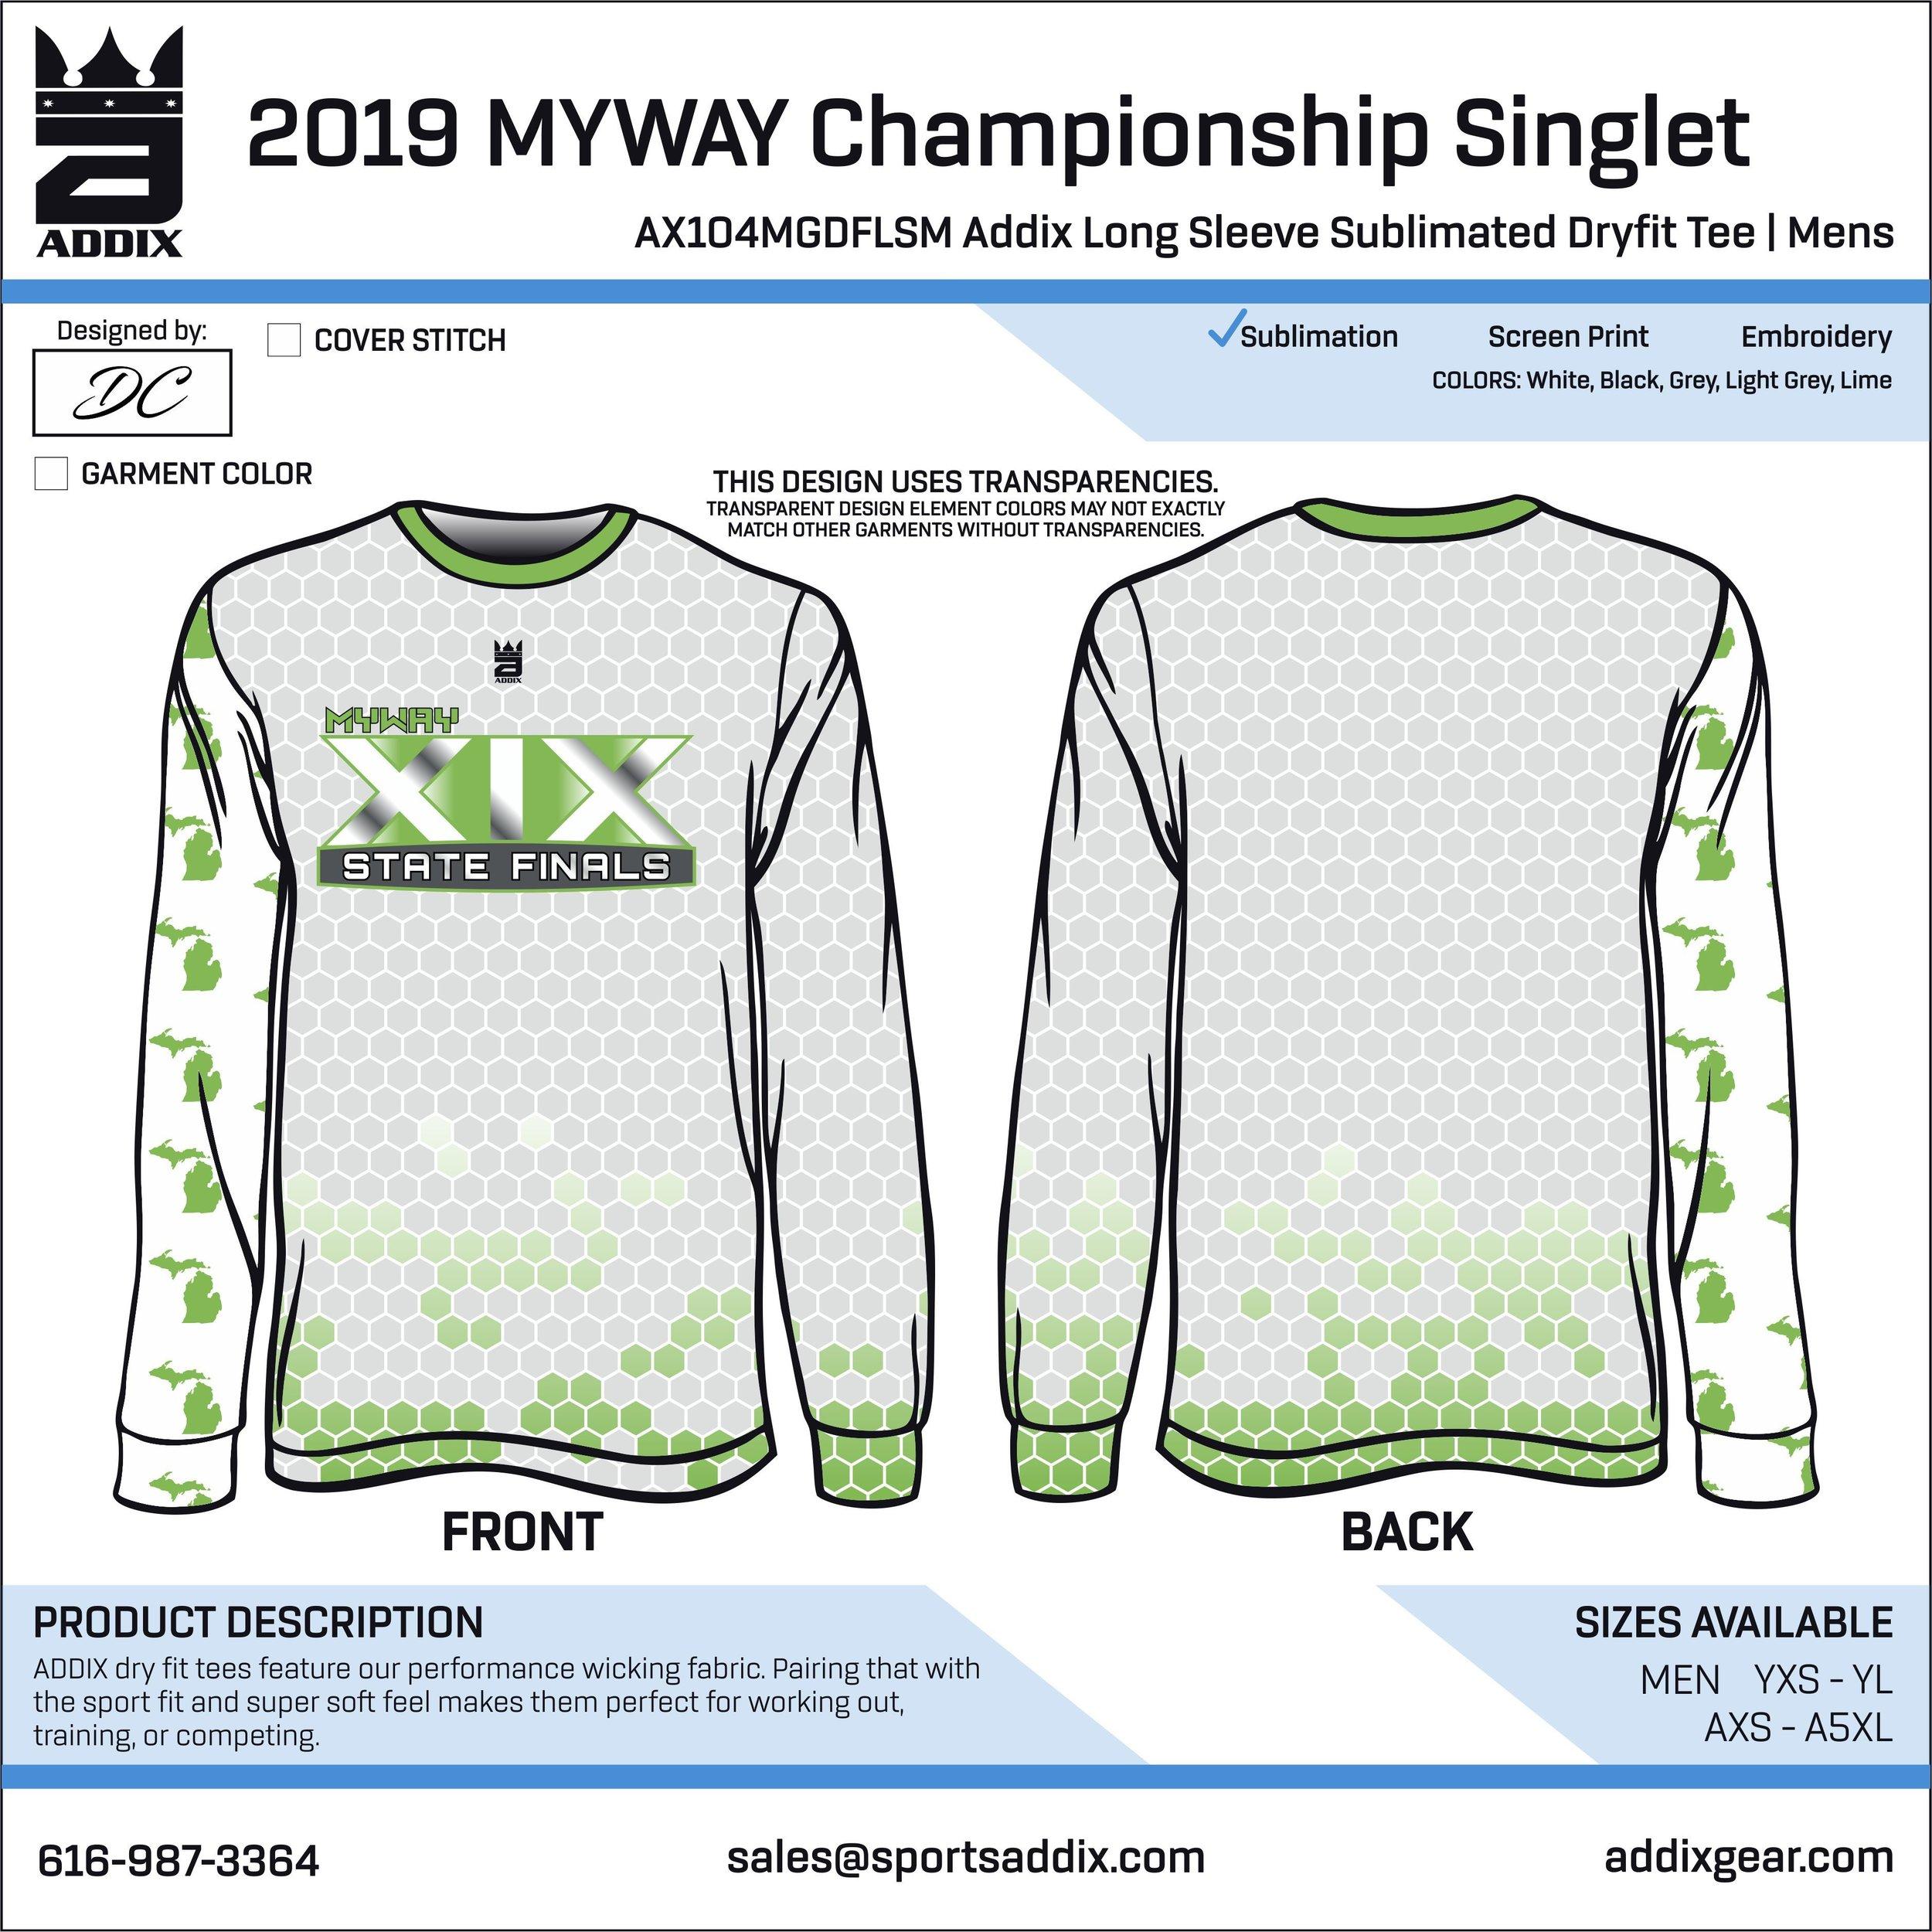 2019 MYWAY Championship Singlet_2019_2-13_DC_LS DF Tee.jpg